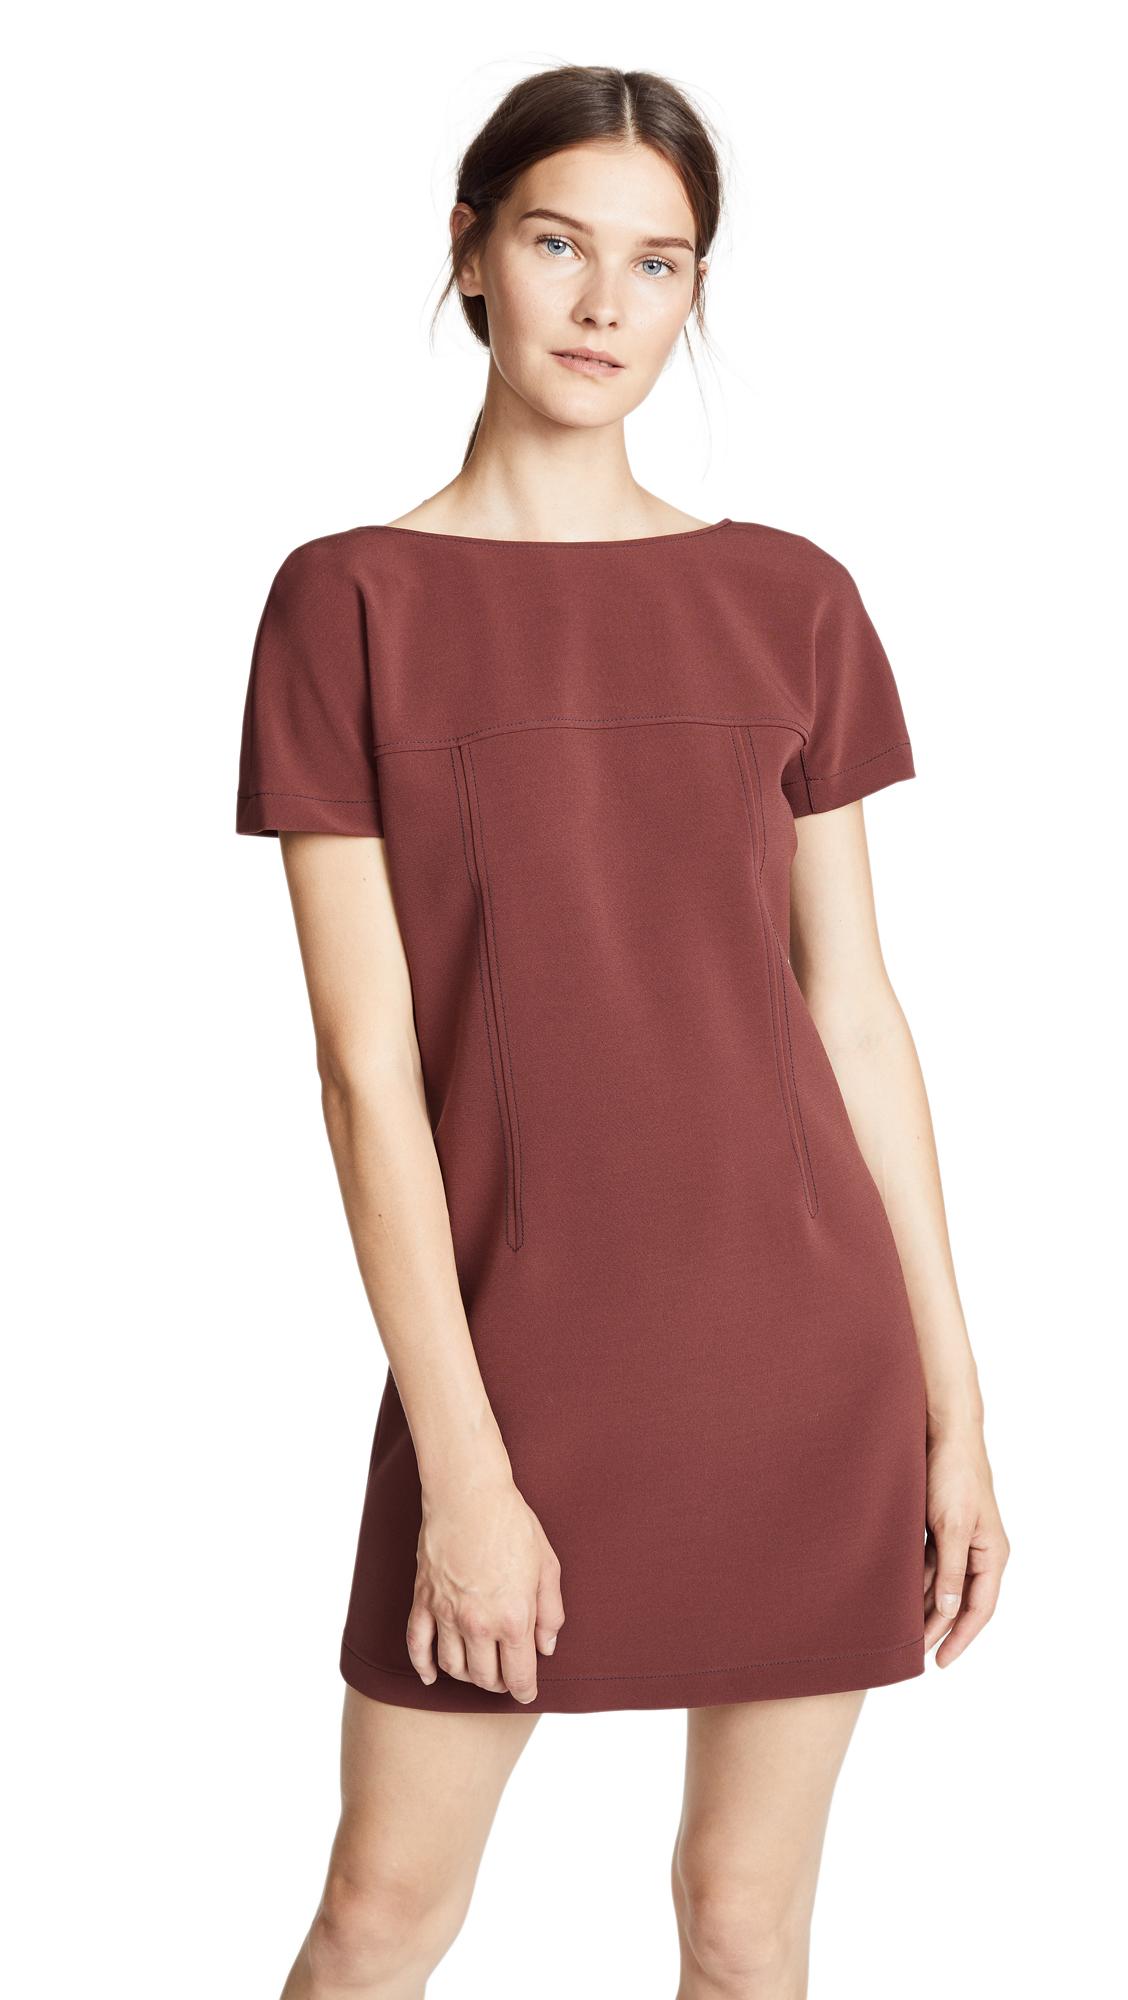 A.P.C. Carter Dress In Vino